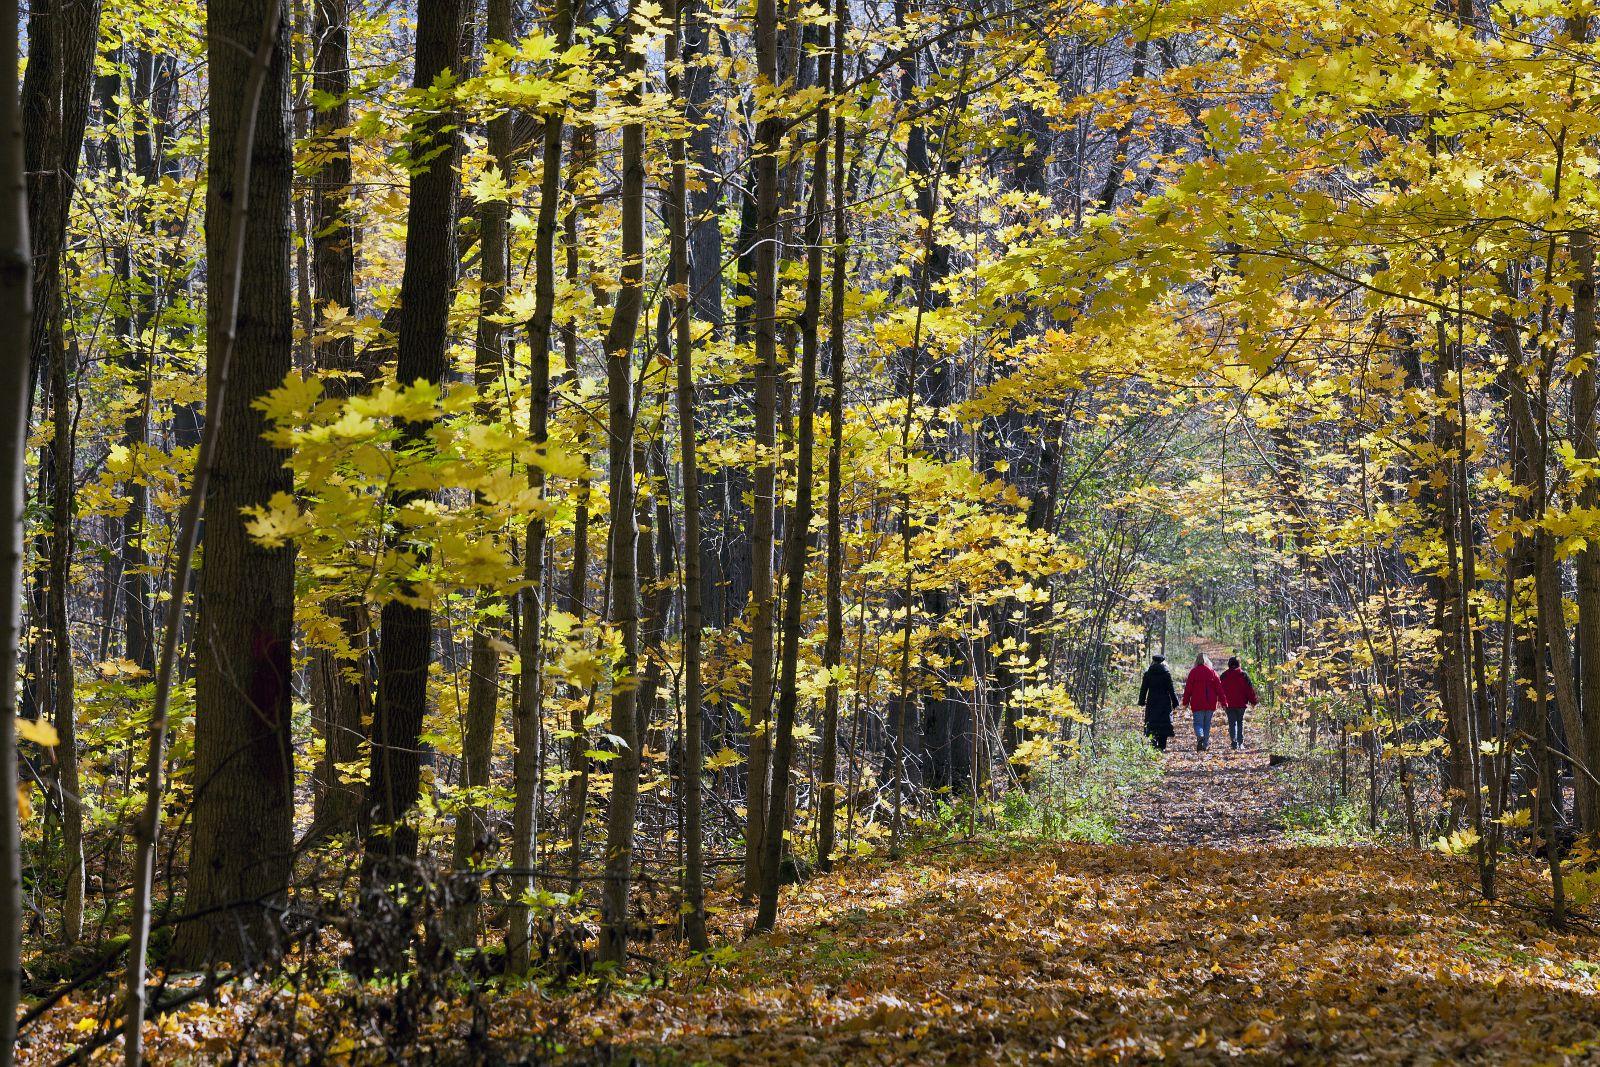 Parc Bois-de-Liesse hiking trail in the fall